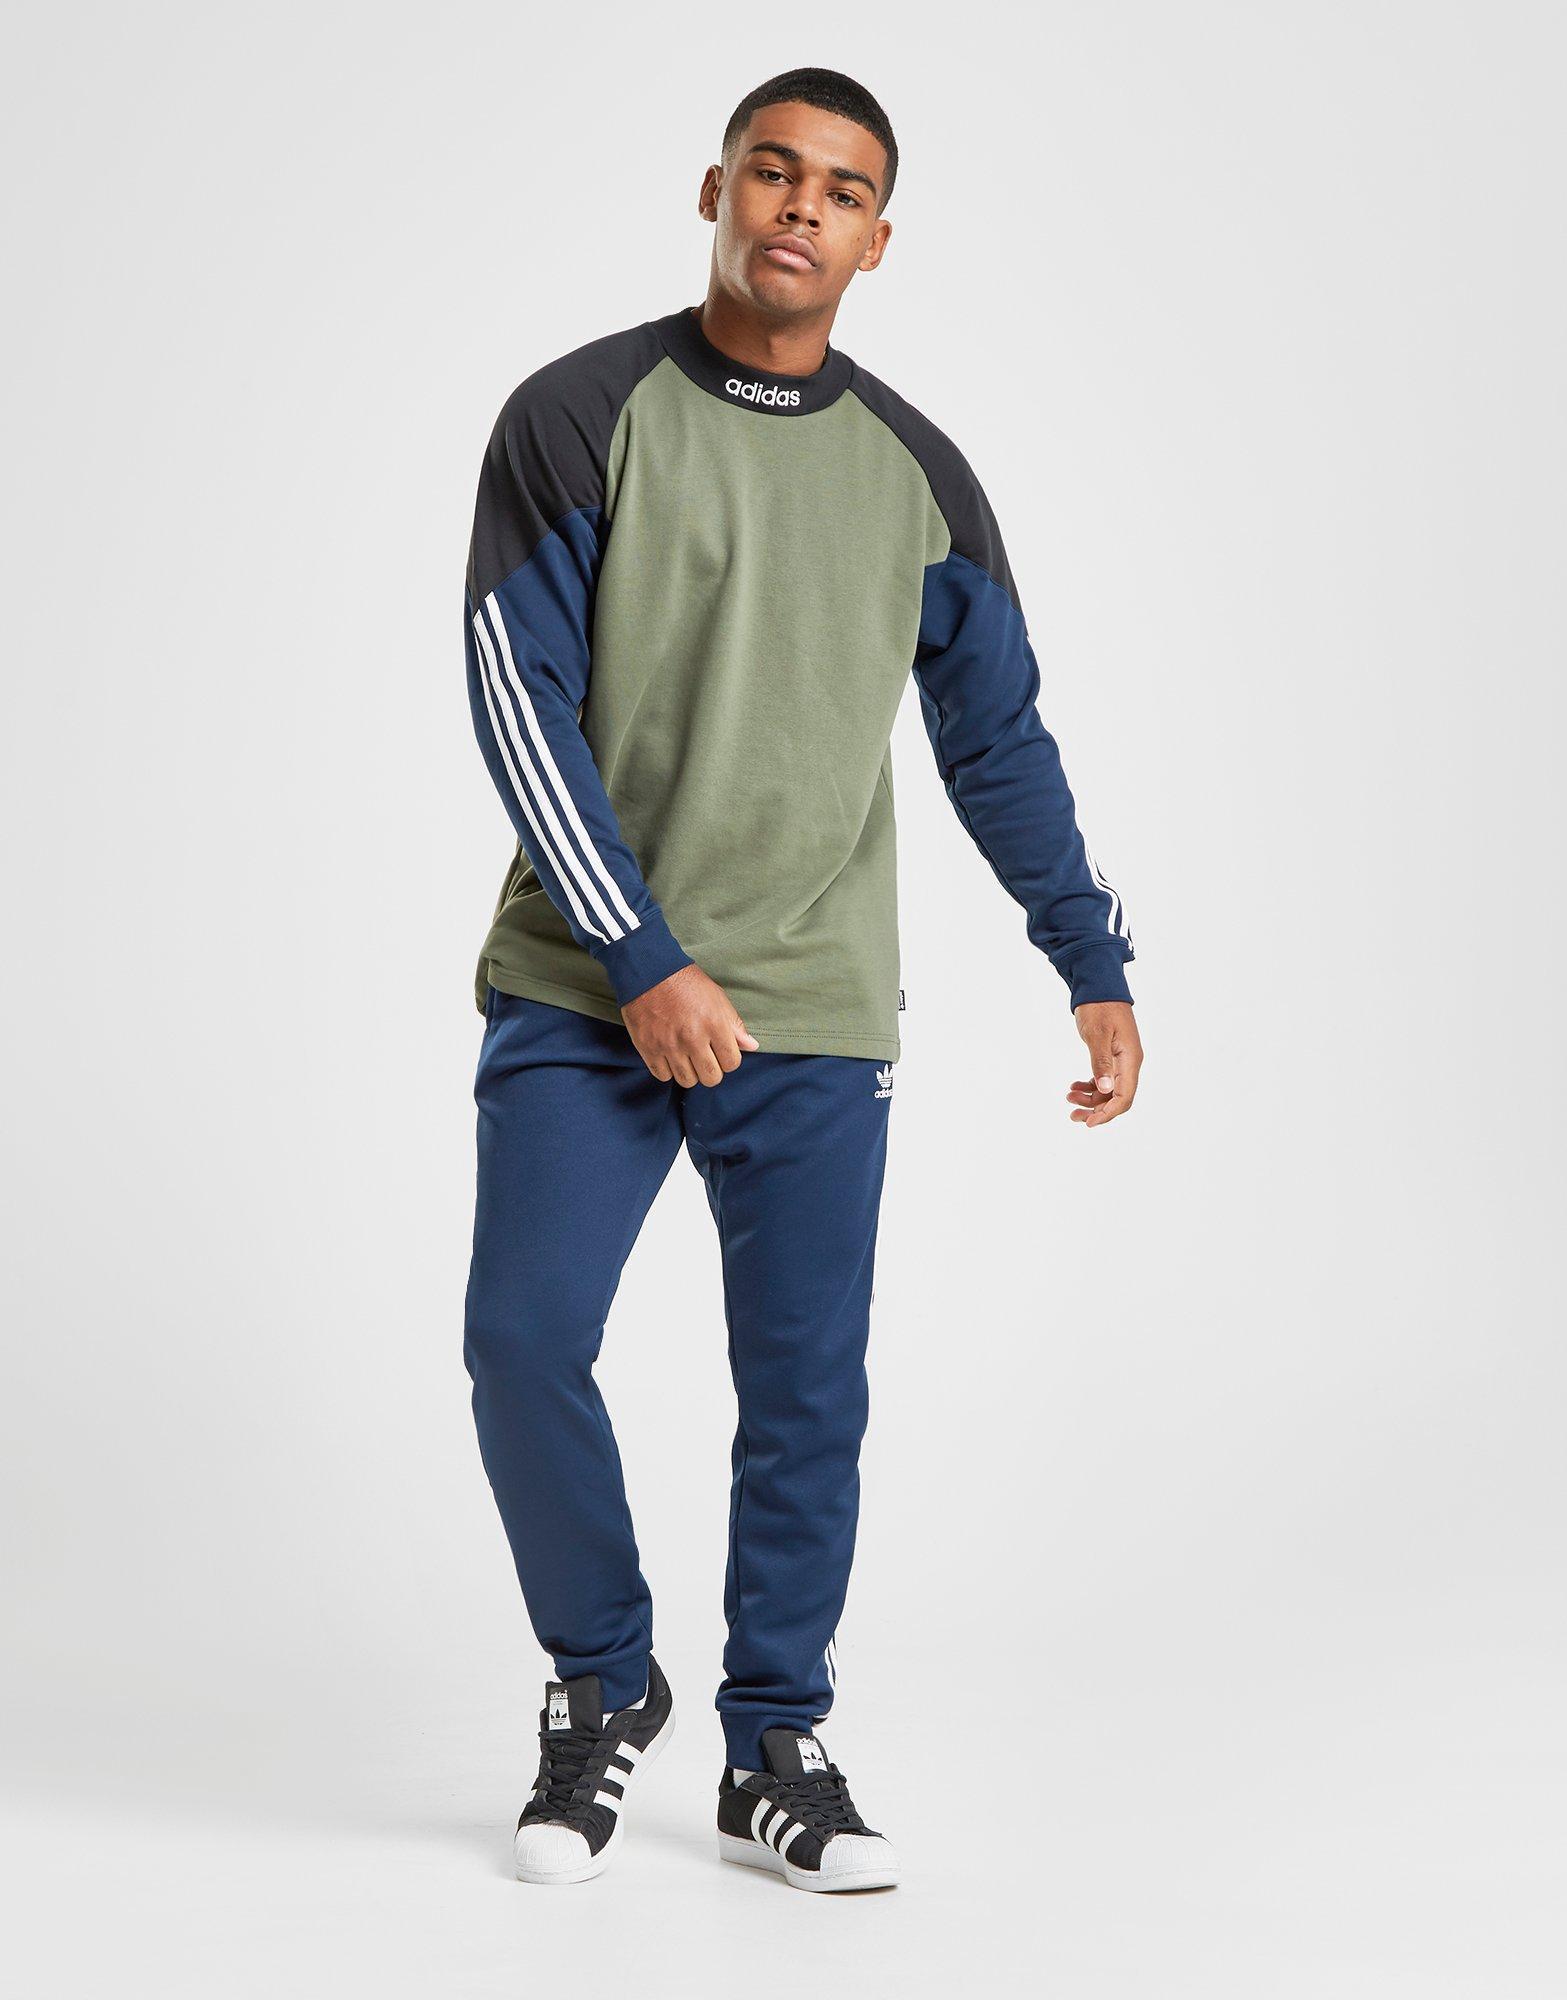 4d4140fbf5b adidas Goalie Fleece Top in Green for Men - Lyst